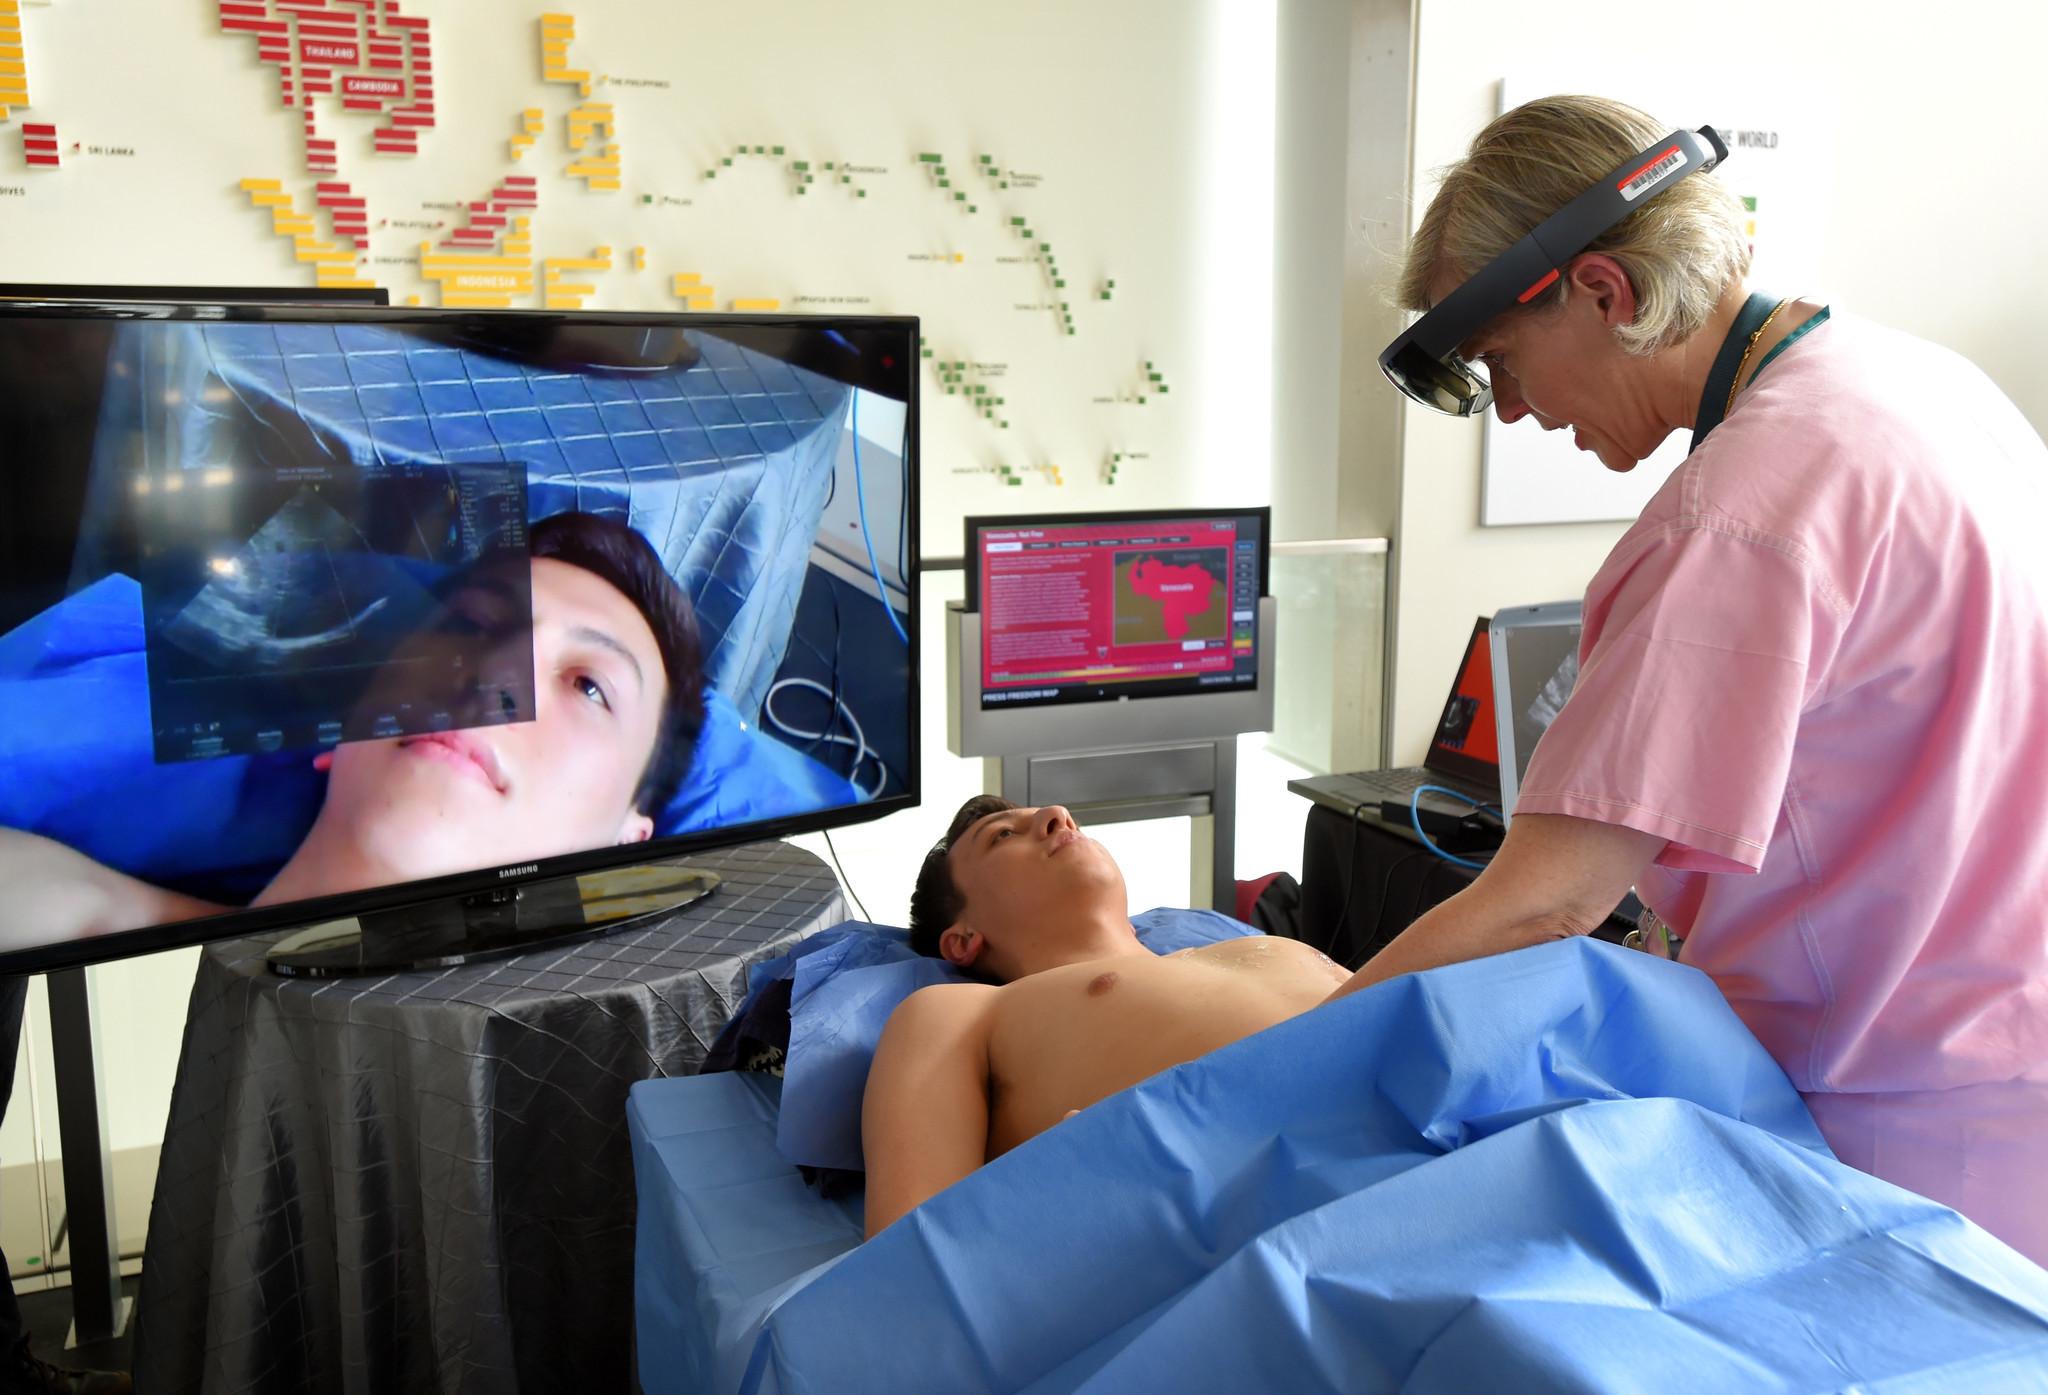 ff0b76fe5715 Bringing virtual reality to medical treatment - Baltimore Sun